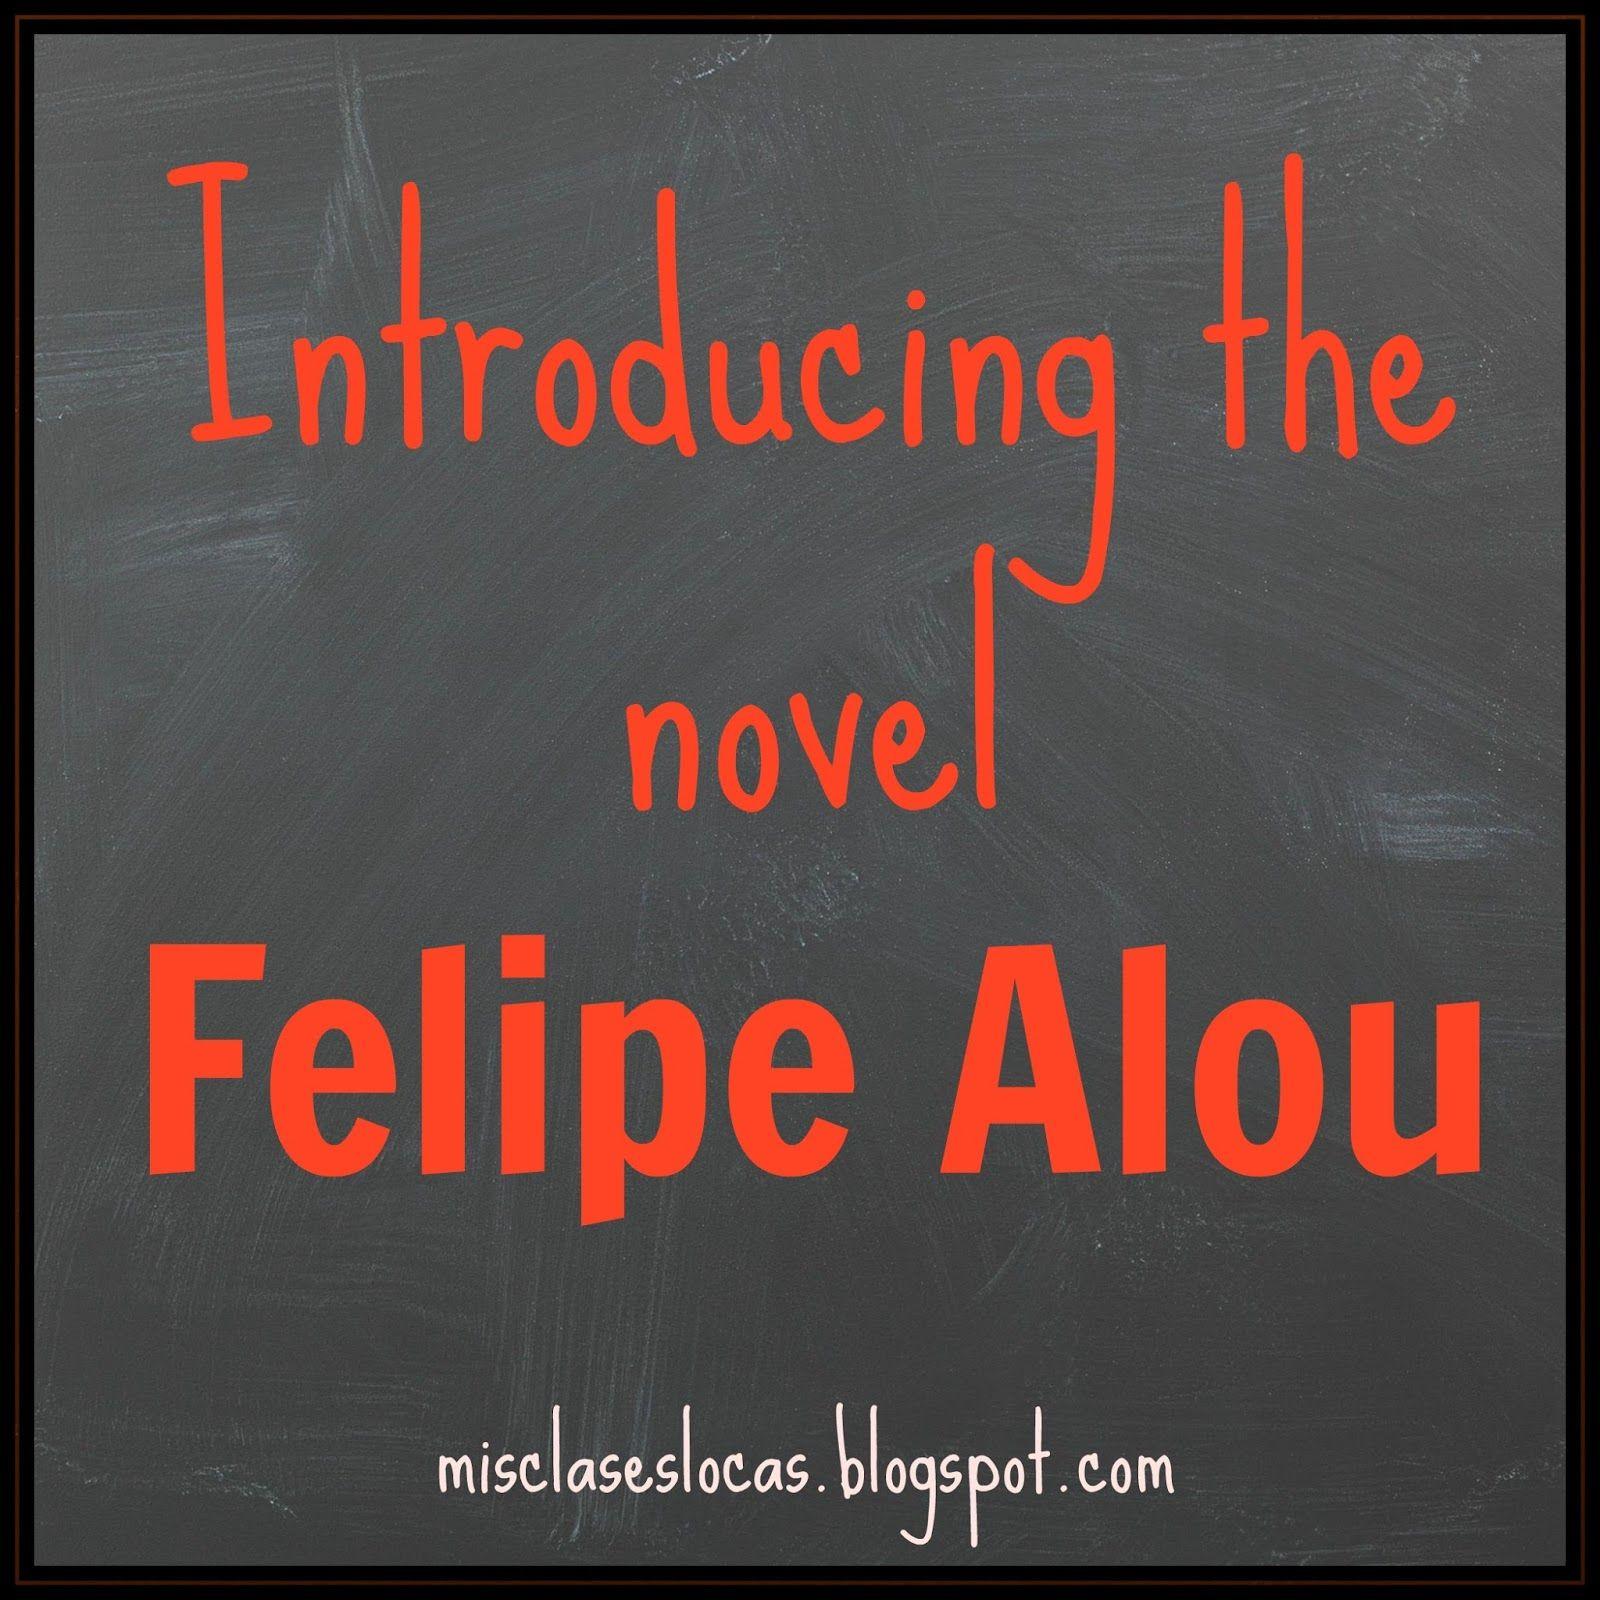 Introducing The Novel Felipe Alou